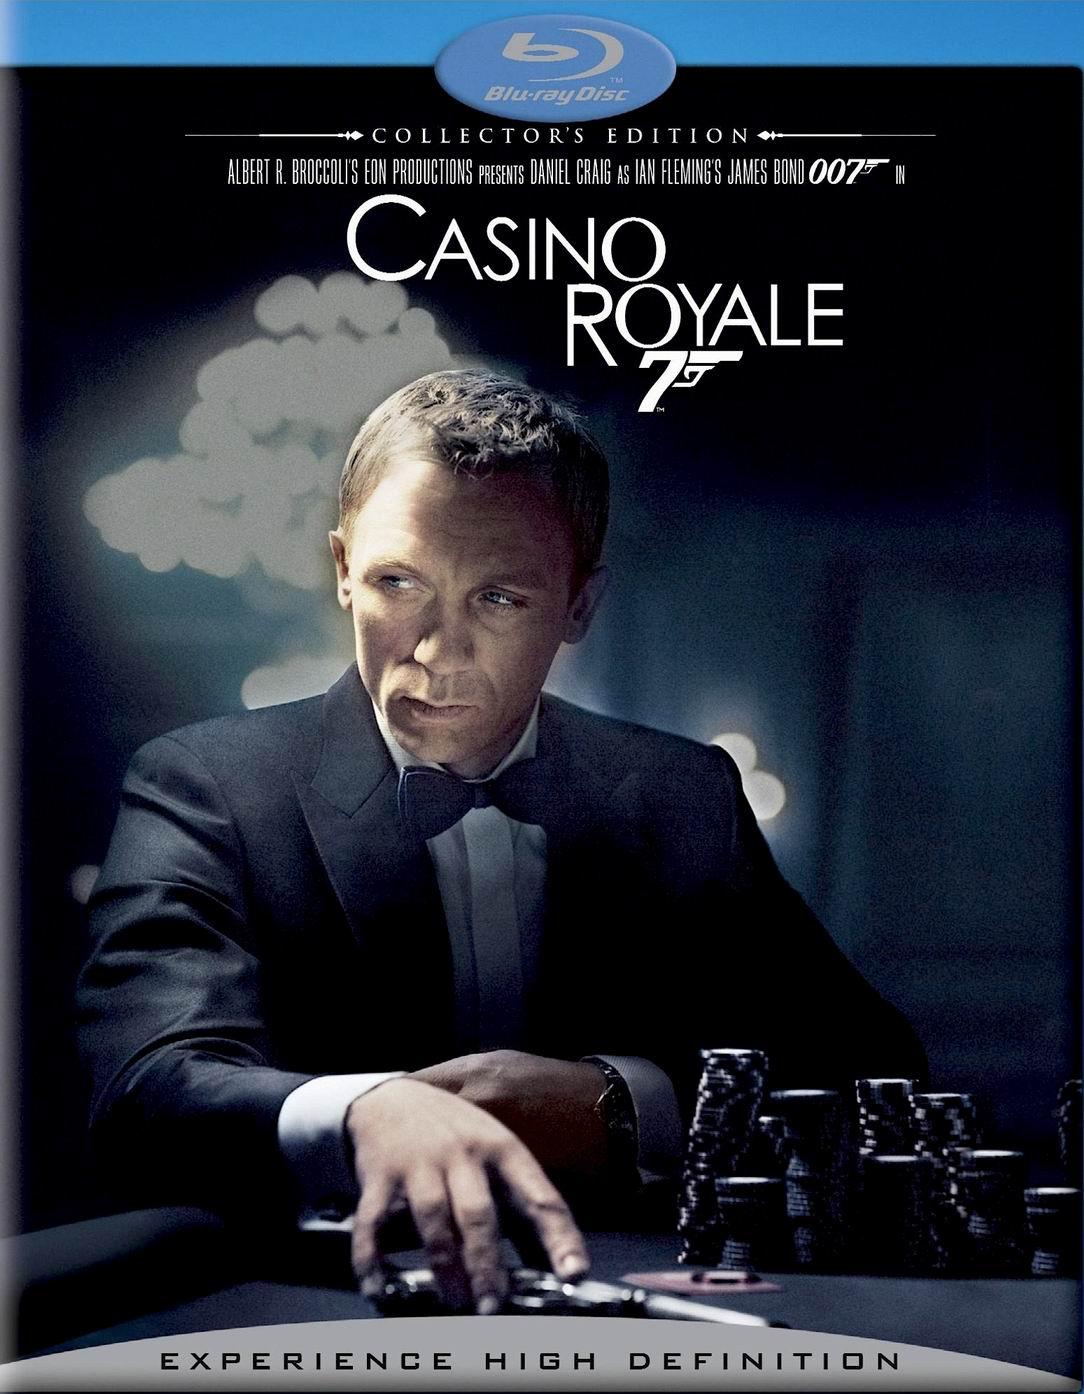 James bond casino royale the video game bettendorf casino